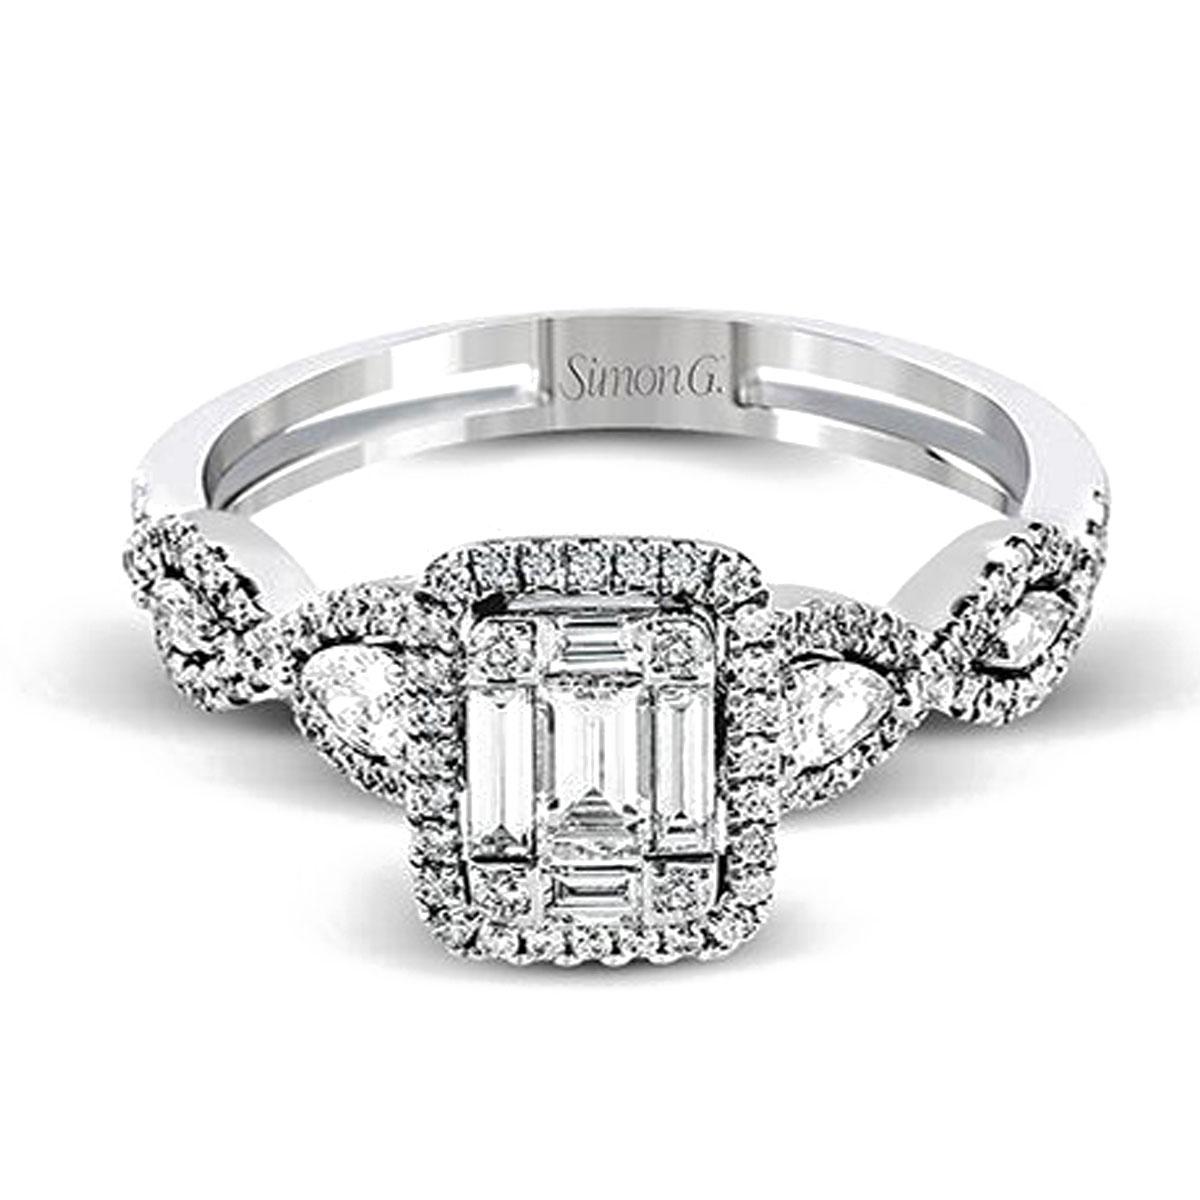 Simon G Engagement Rings Mosaic 28ctw Diamond Accents